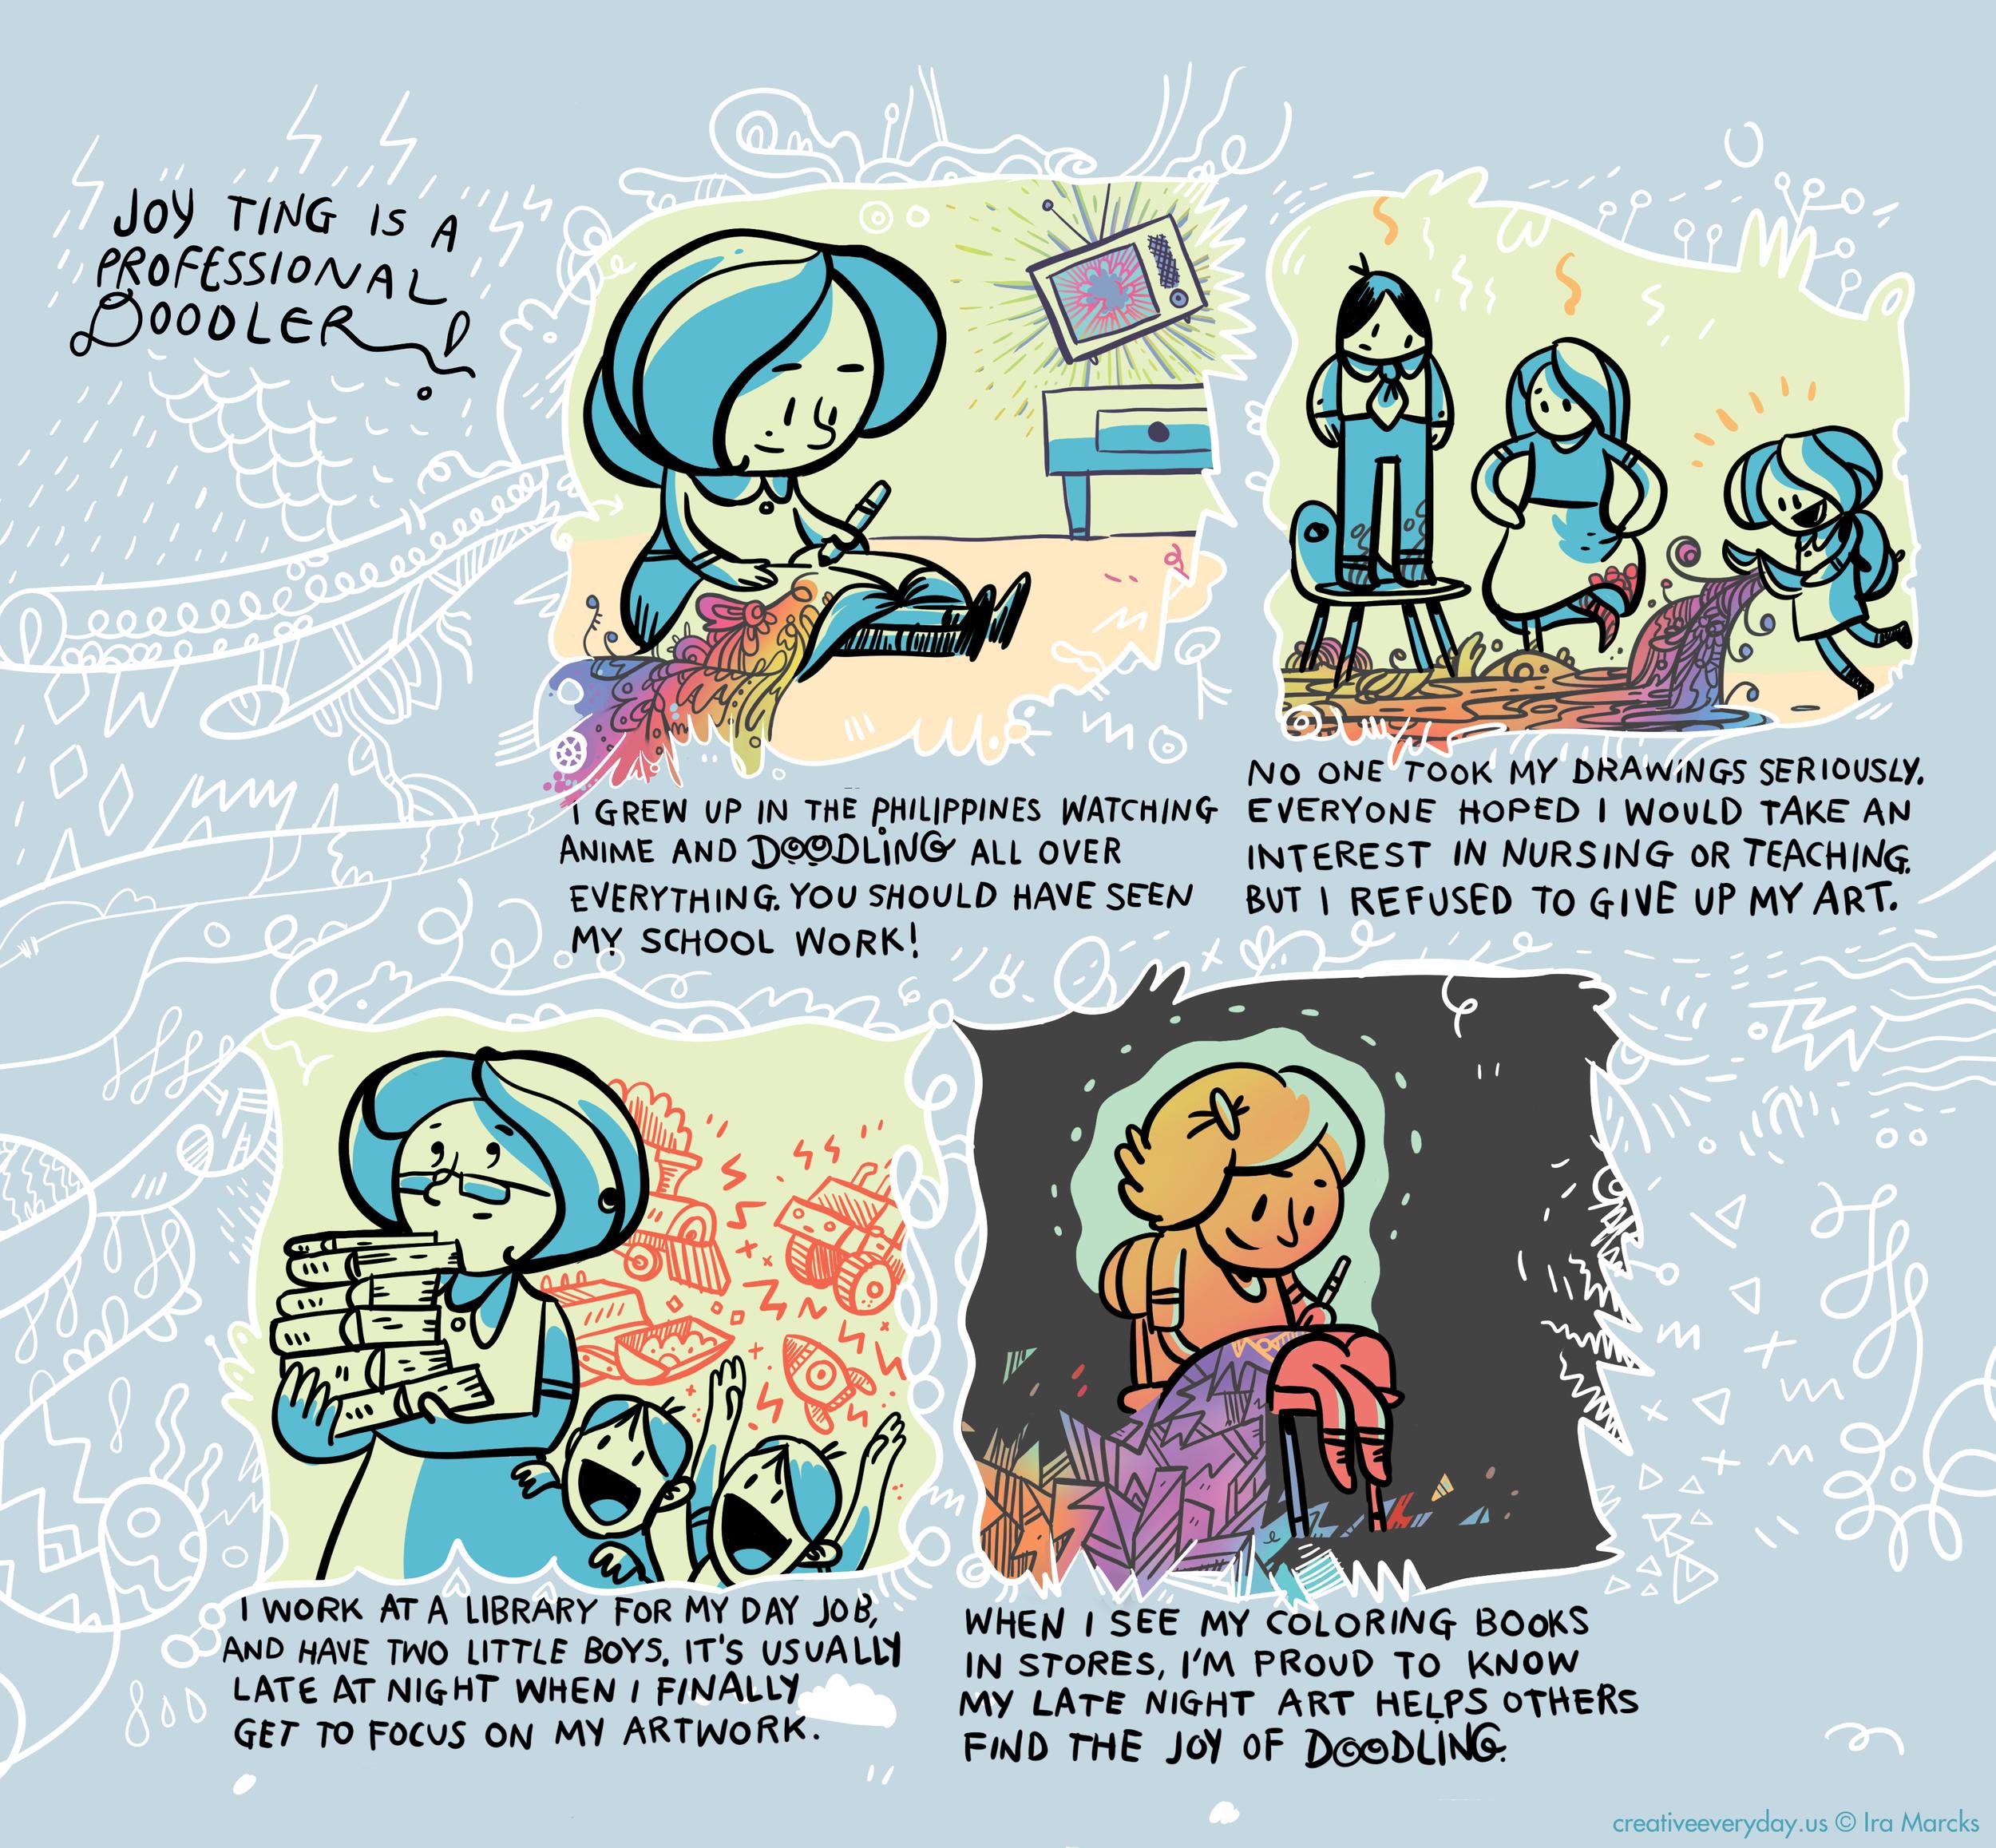 Joy / Coloring Book Artist